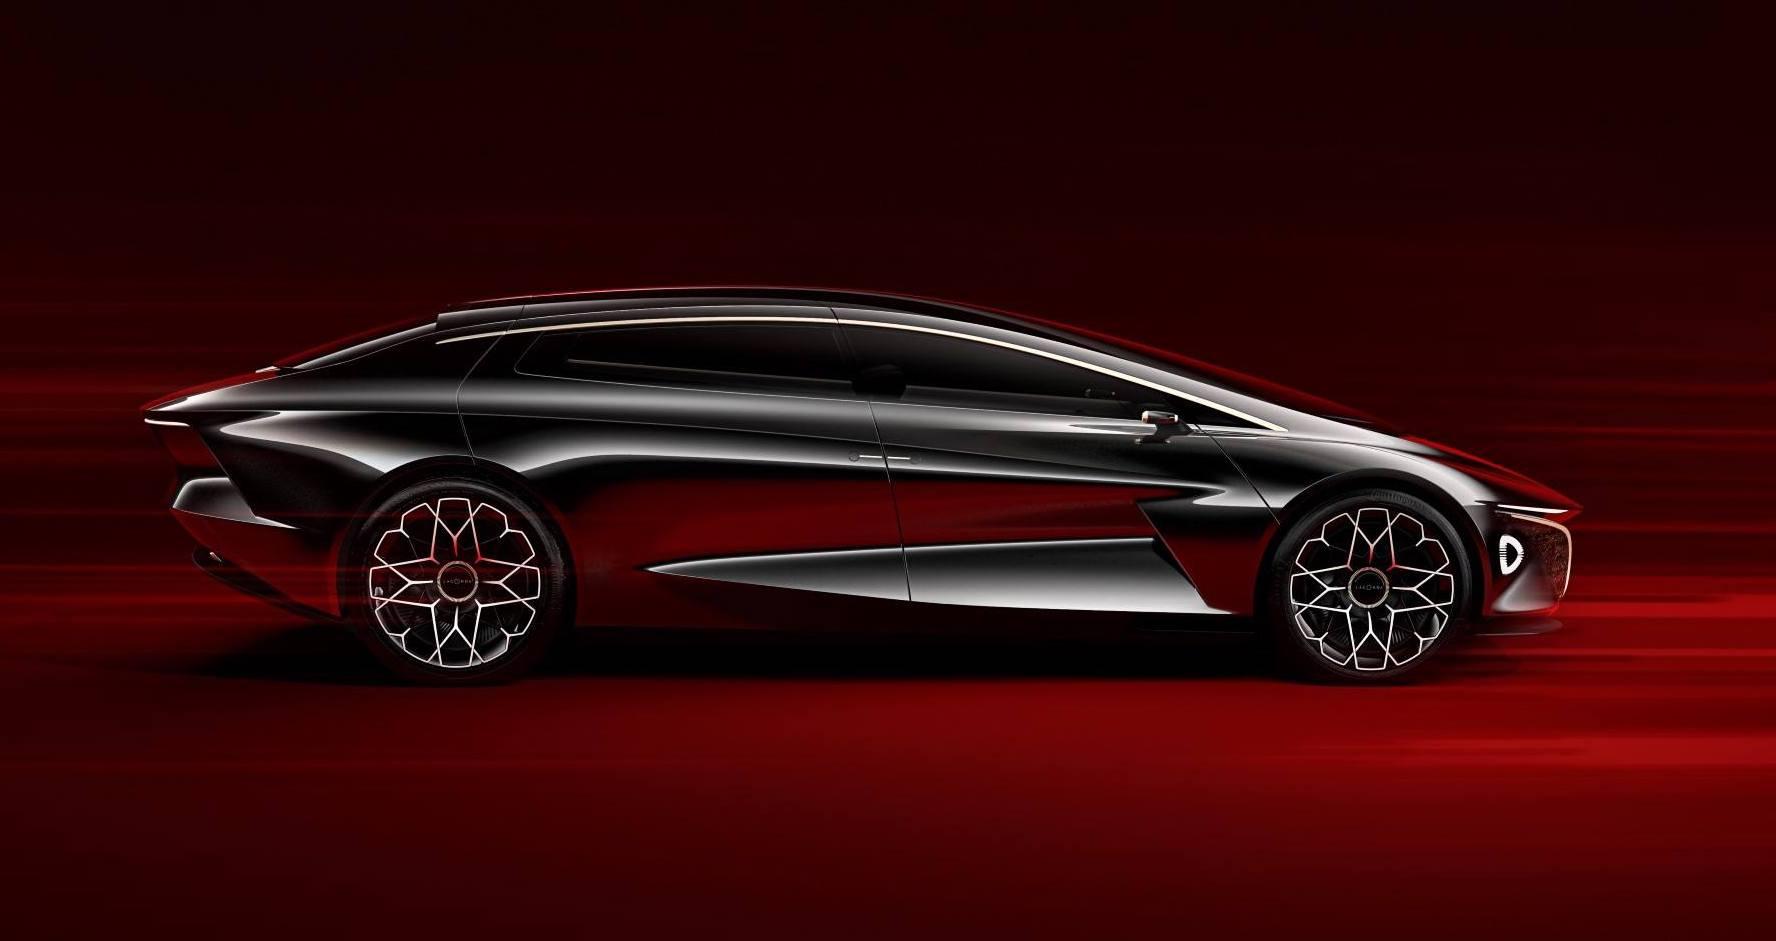 Aston Martin sorprende con el Lagonda Vision Concept